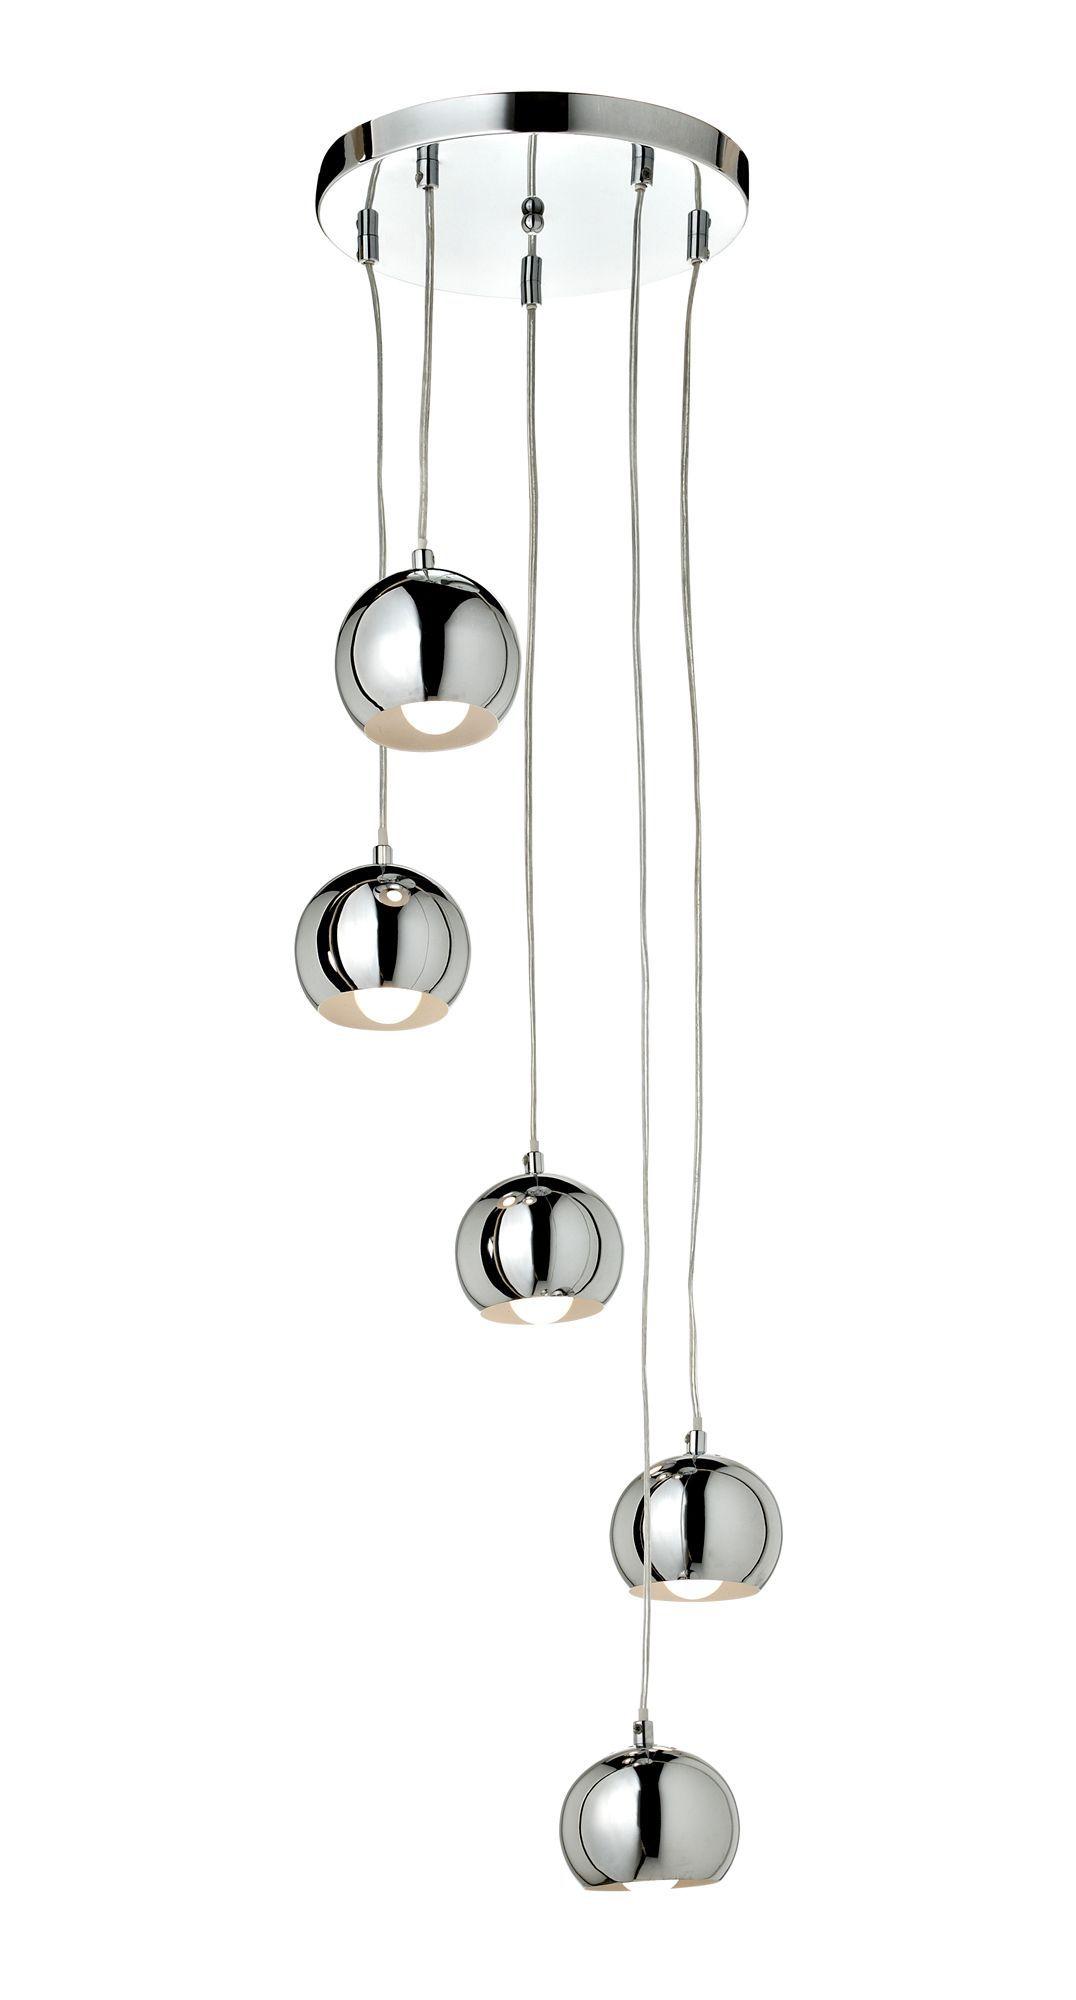 Cascade Chrome Effect 5 Lamp Ceiling Light